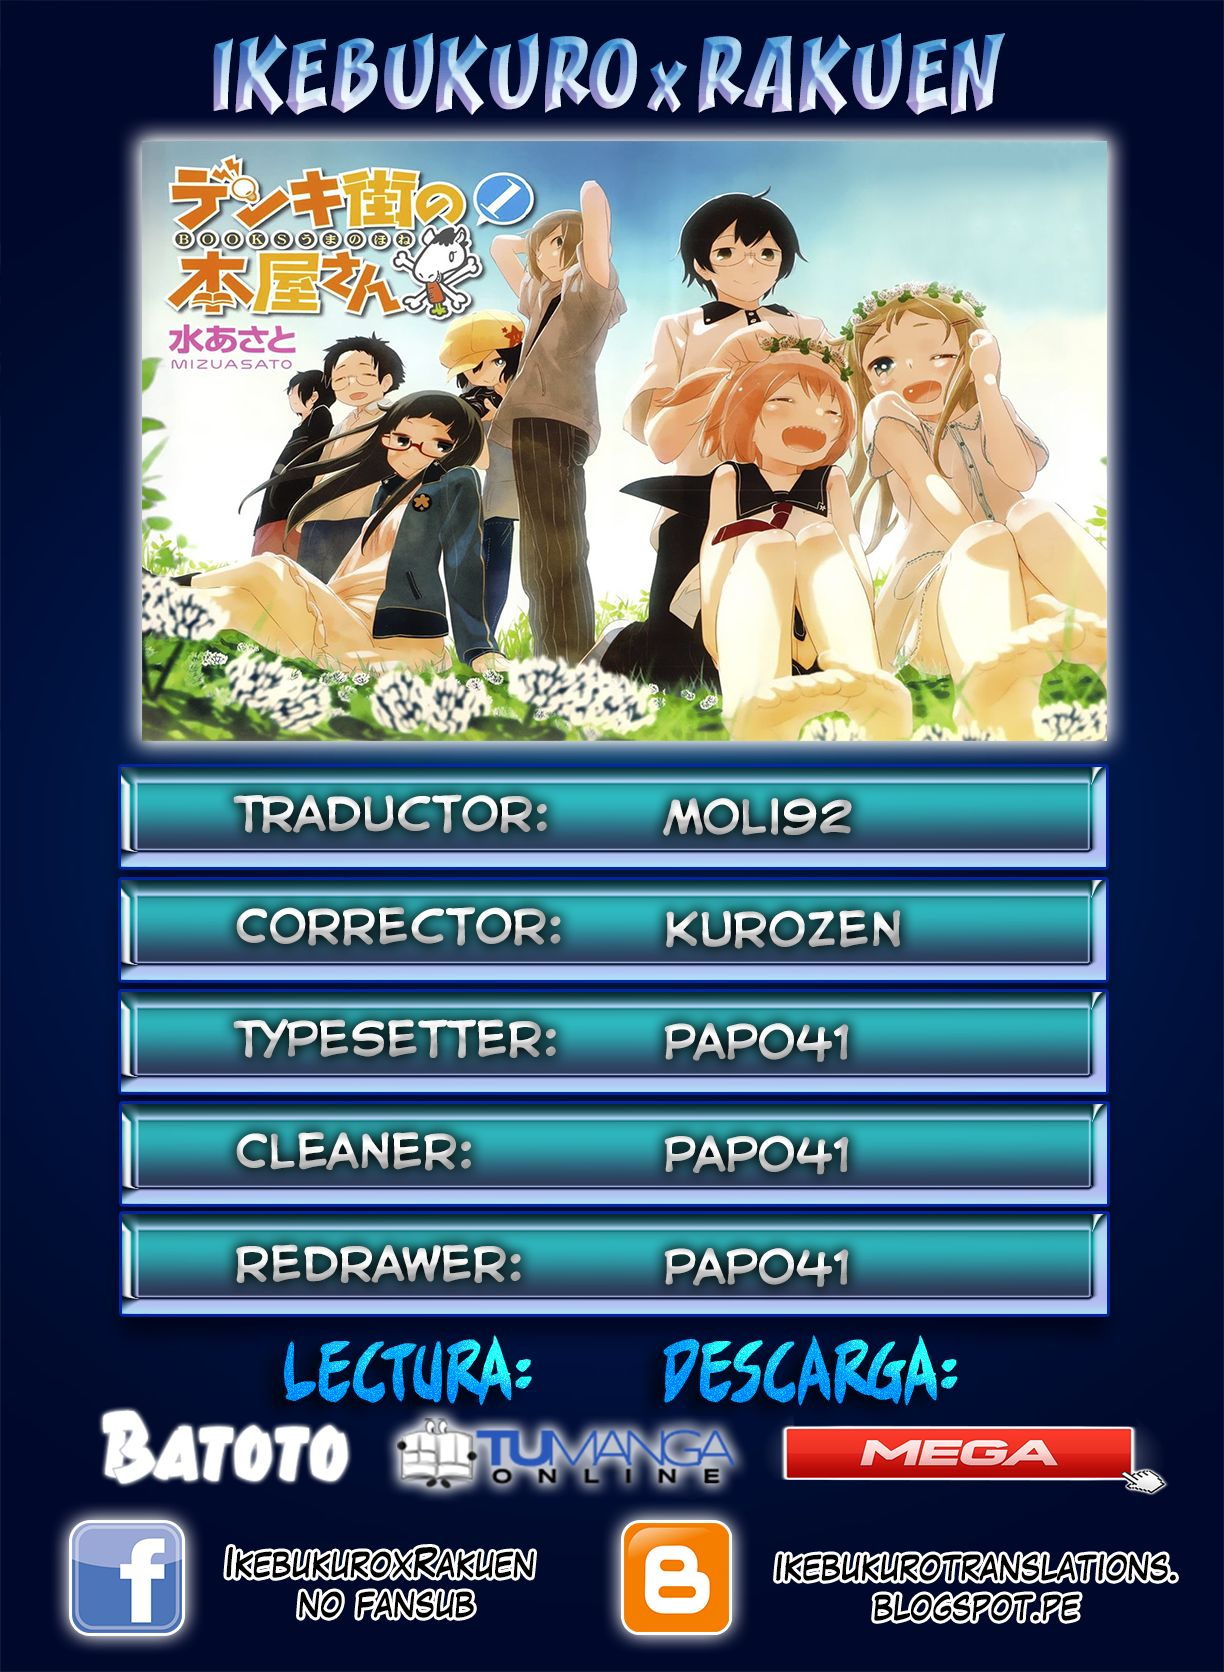 https://c5.ninemanga.com/es_manga/14/16334/439751/b43c540b0ca209795435333d740c6768.jpg Page 1